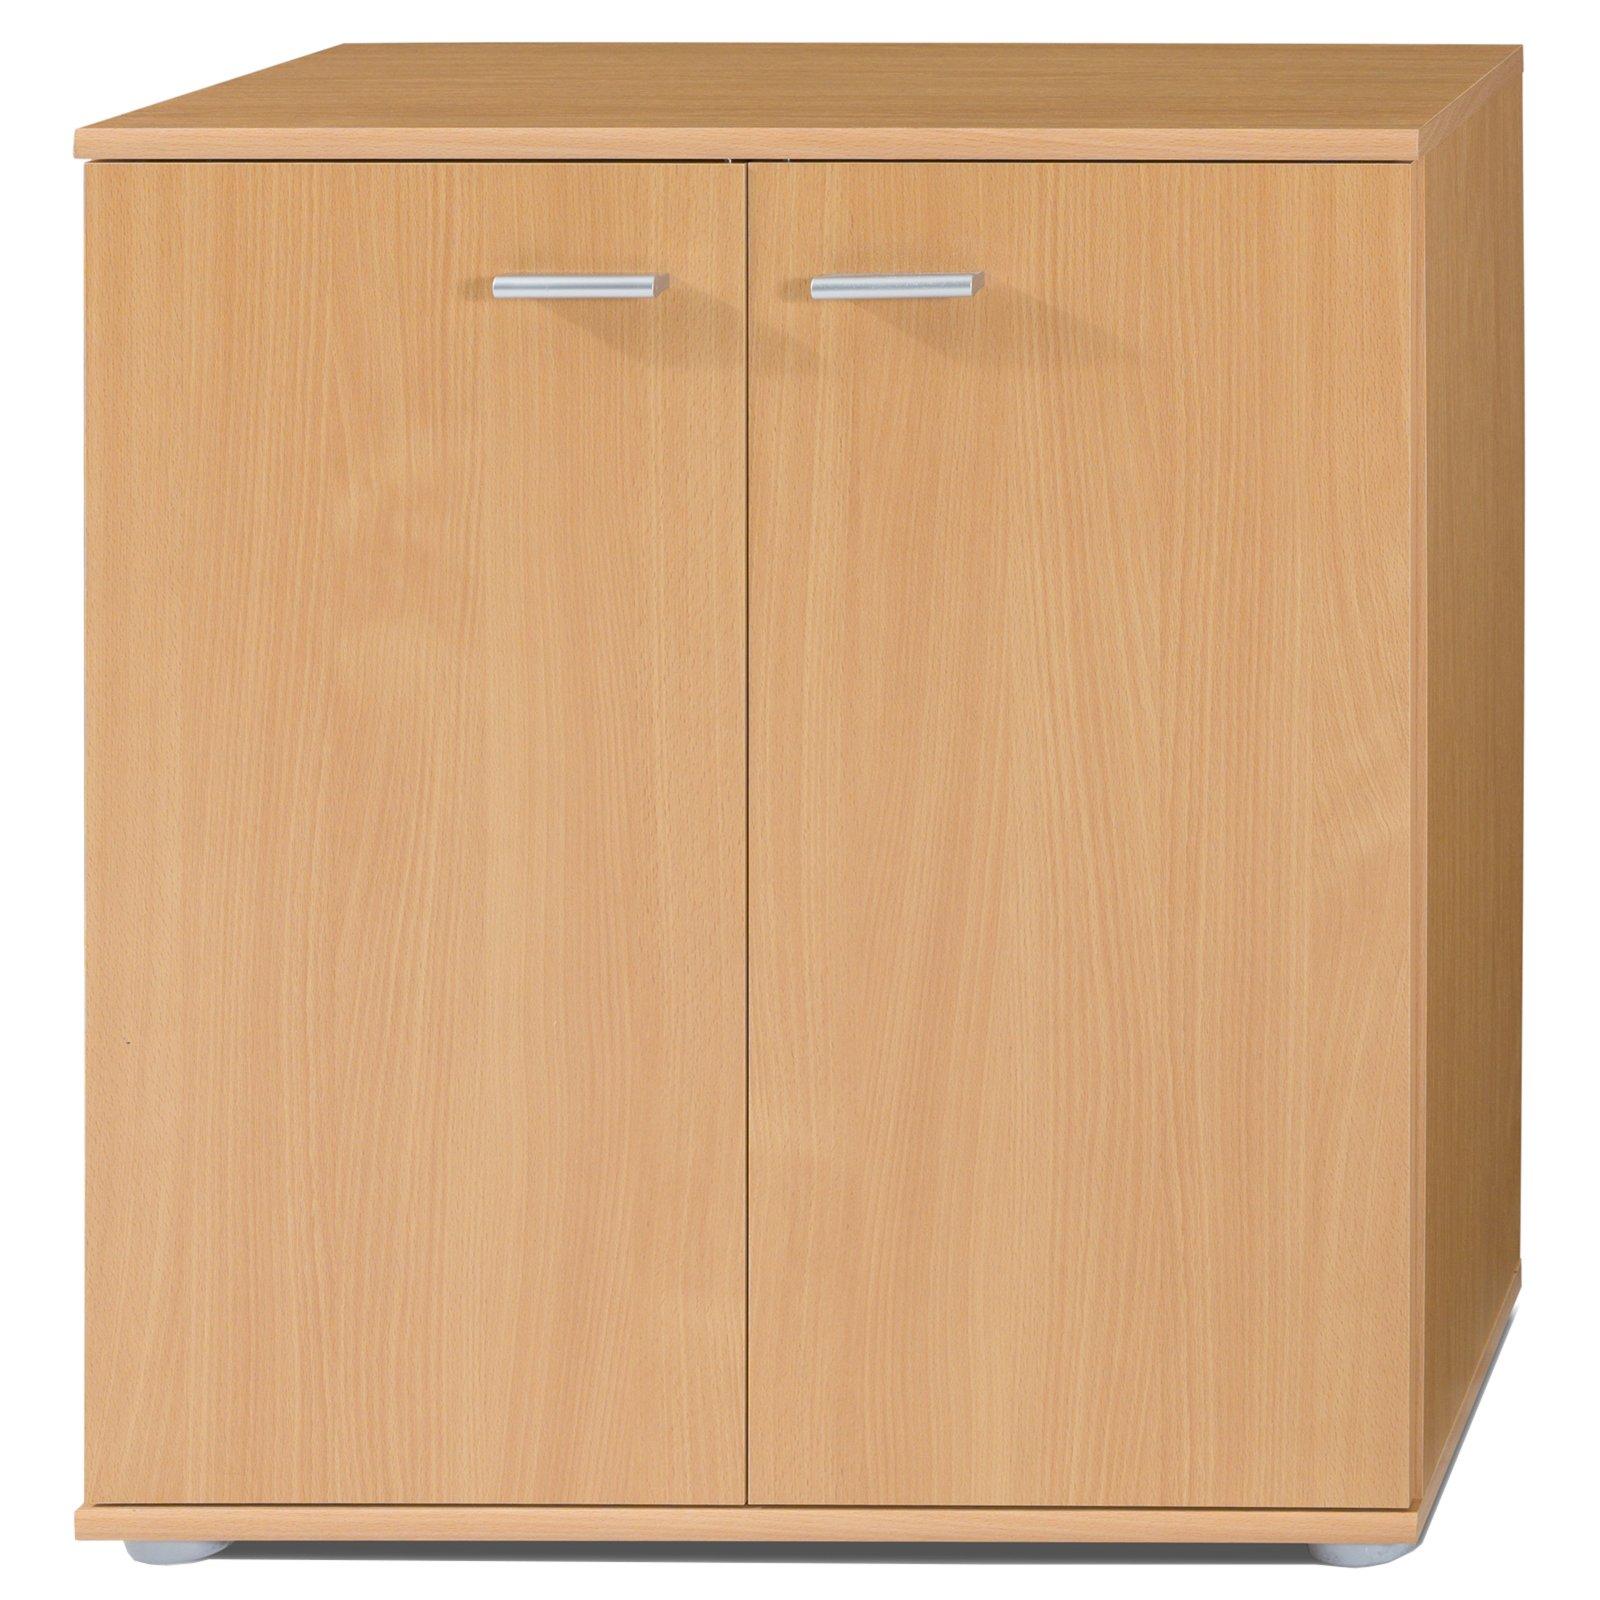 kommode mike 3 buche 2 t ren 71 cm kommoden sideboards m bel roller m belhaus. Black Bedroom Furniture Sets. Home Design Ideas